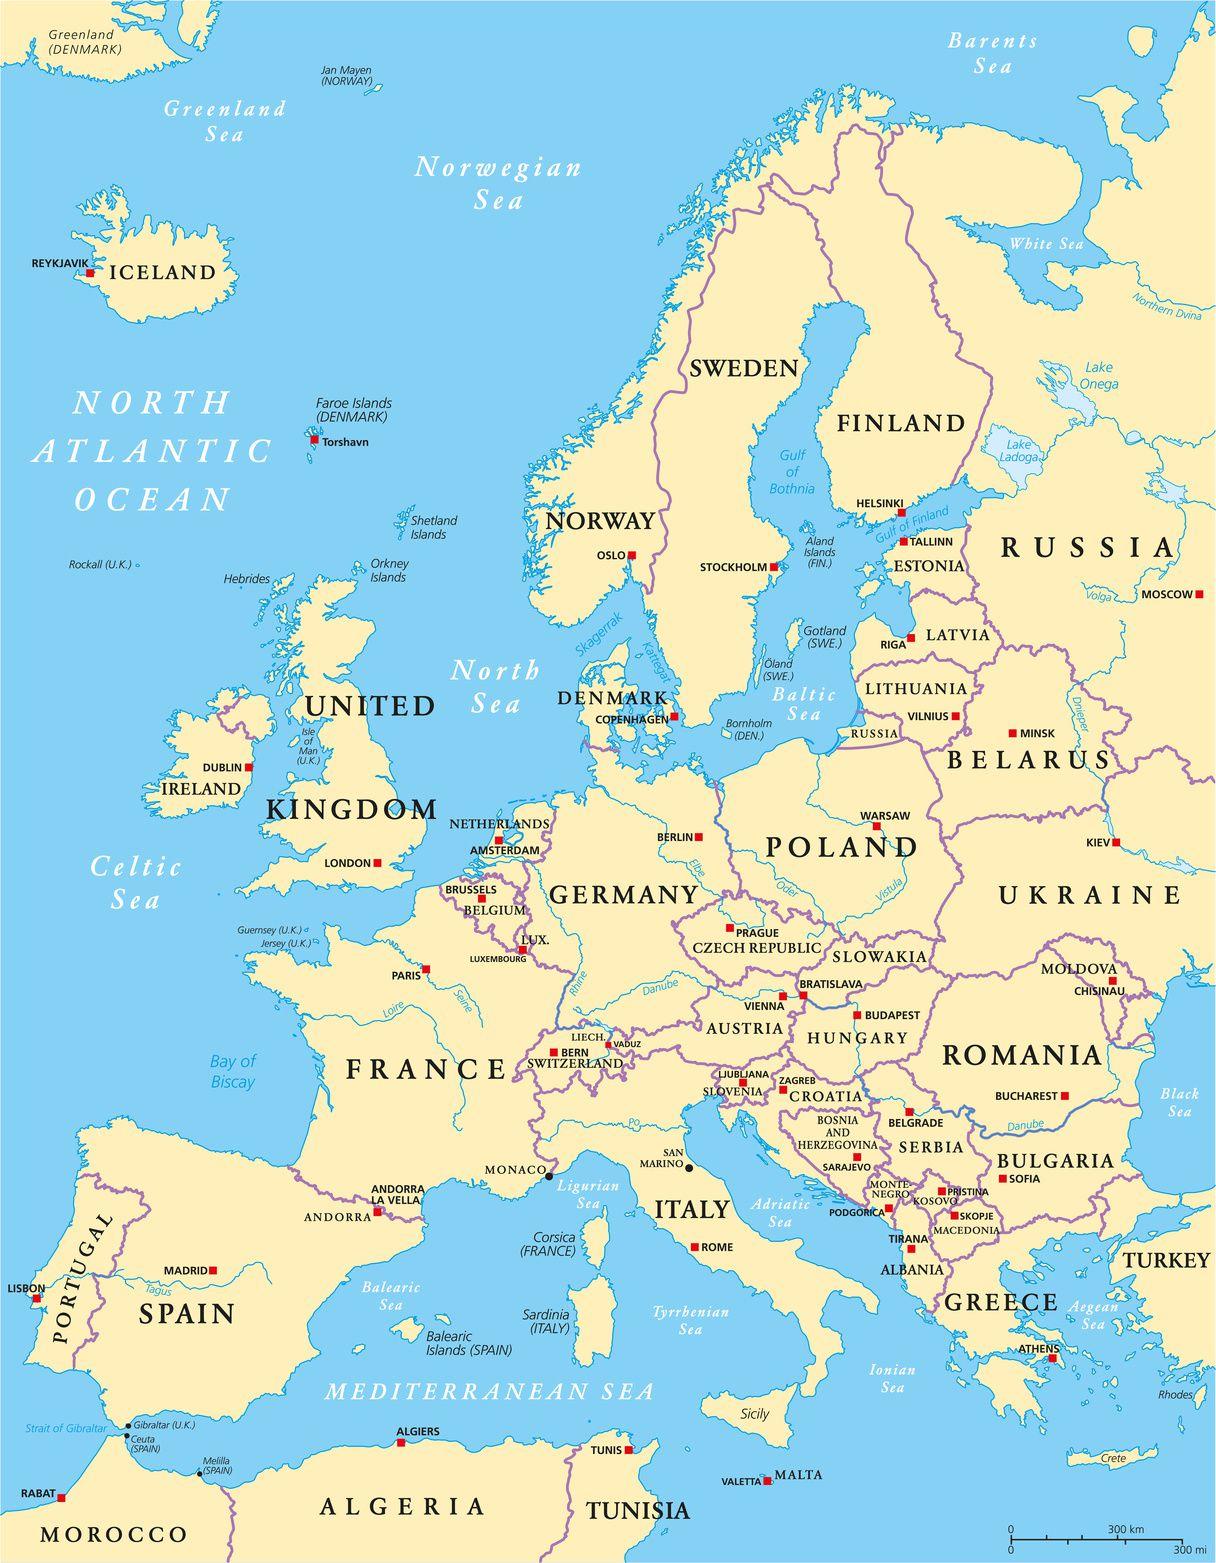 Carte De L'europe - Cartes Reliefs, Villes, Pays, Euro, Ue serapportantà Carte Fleuve Europe Vierge